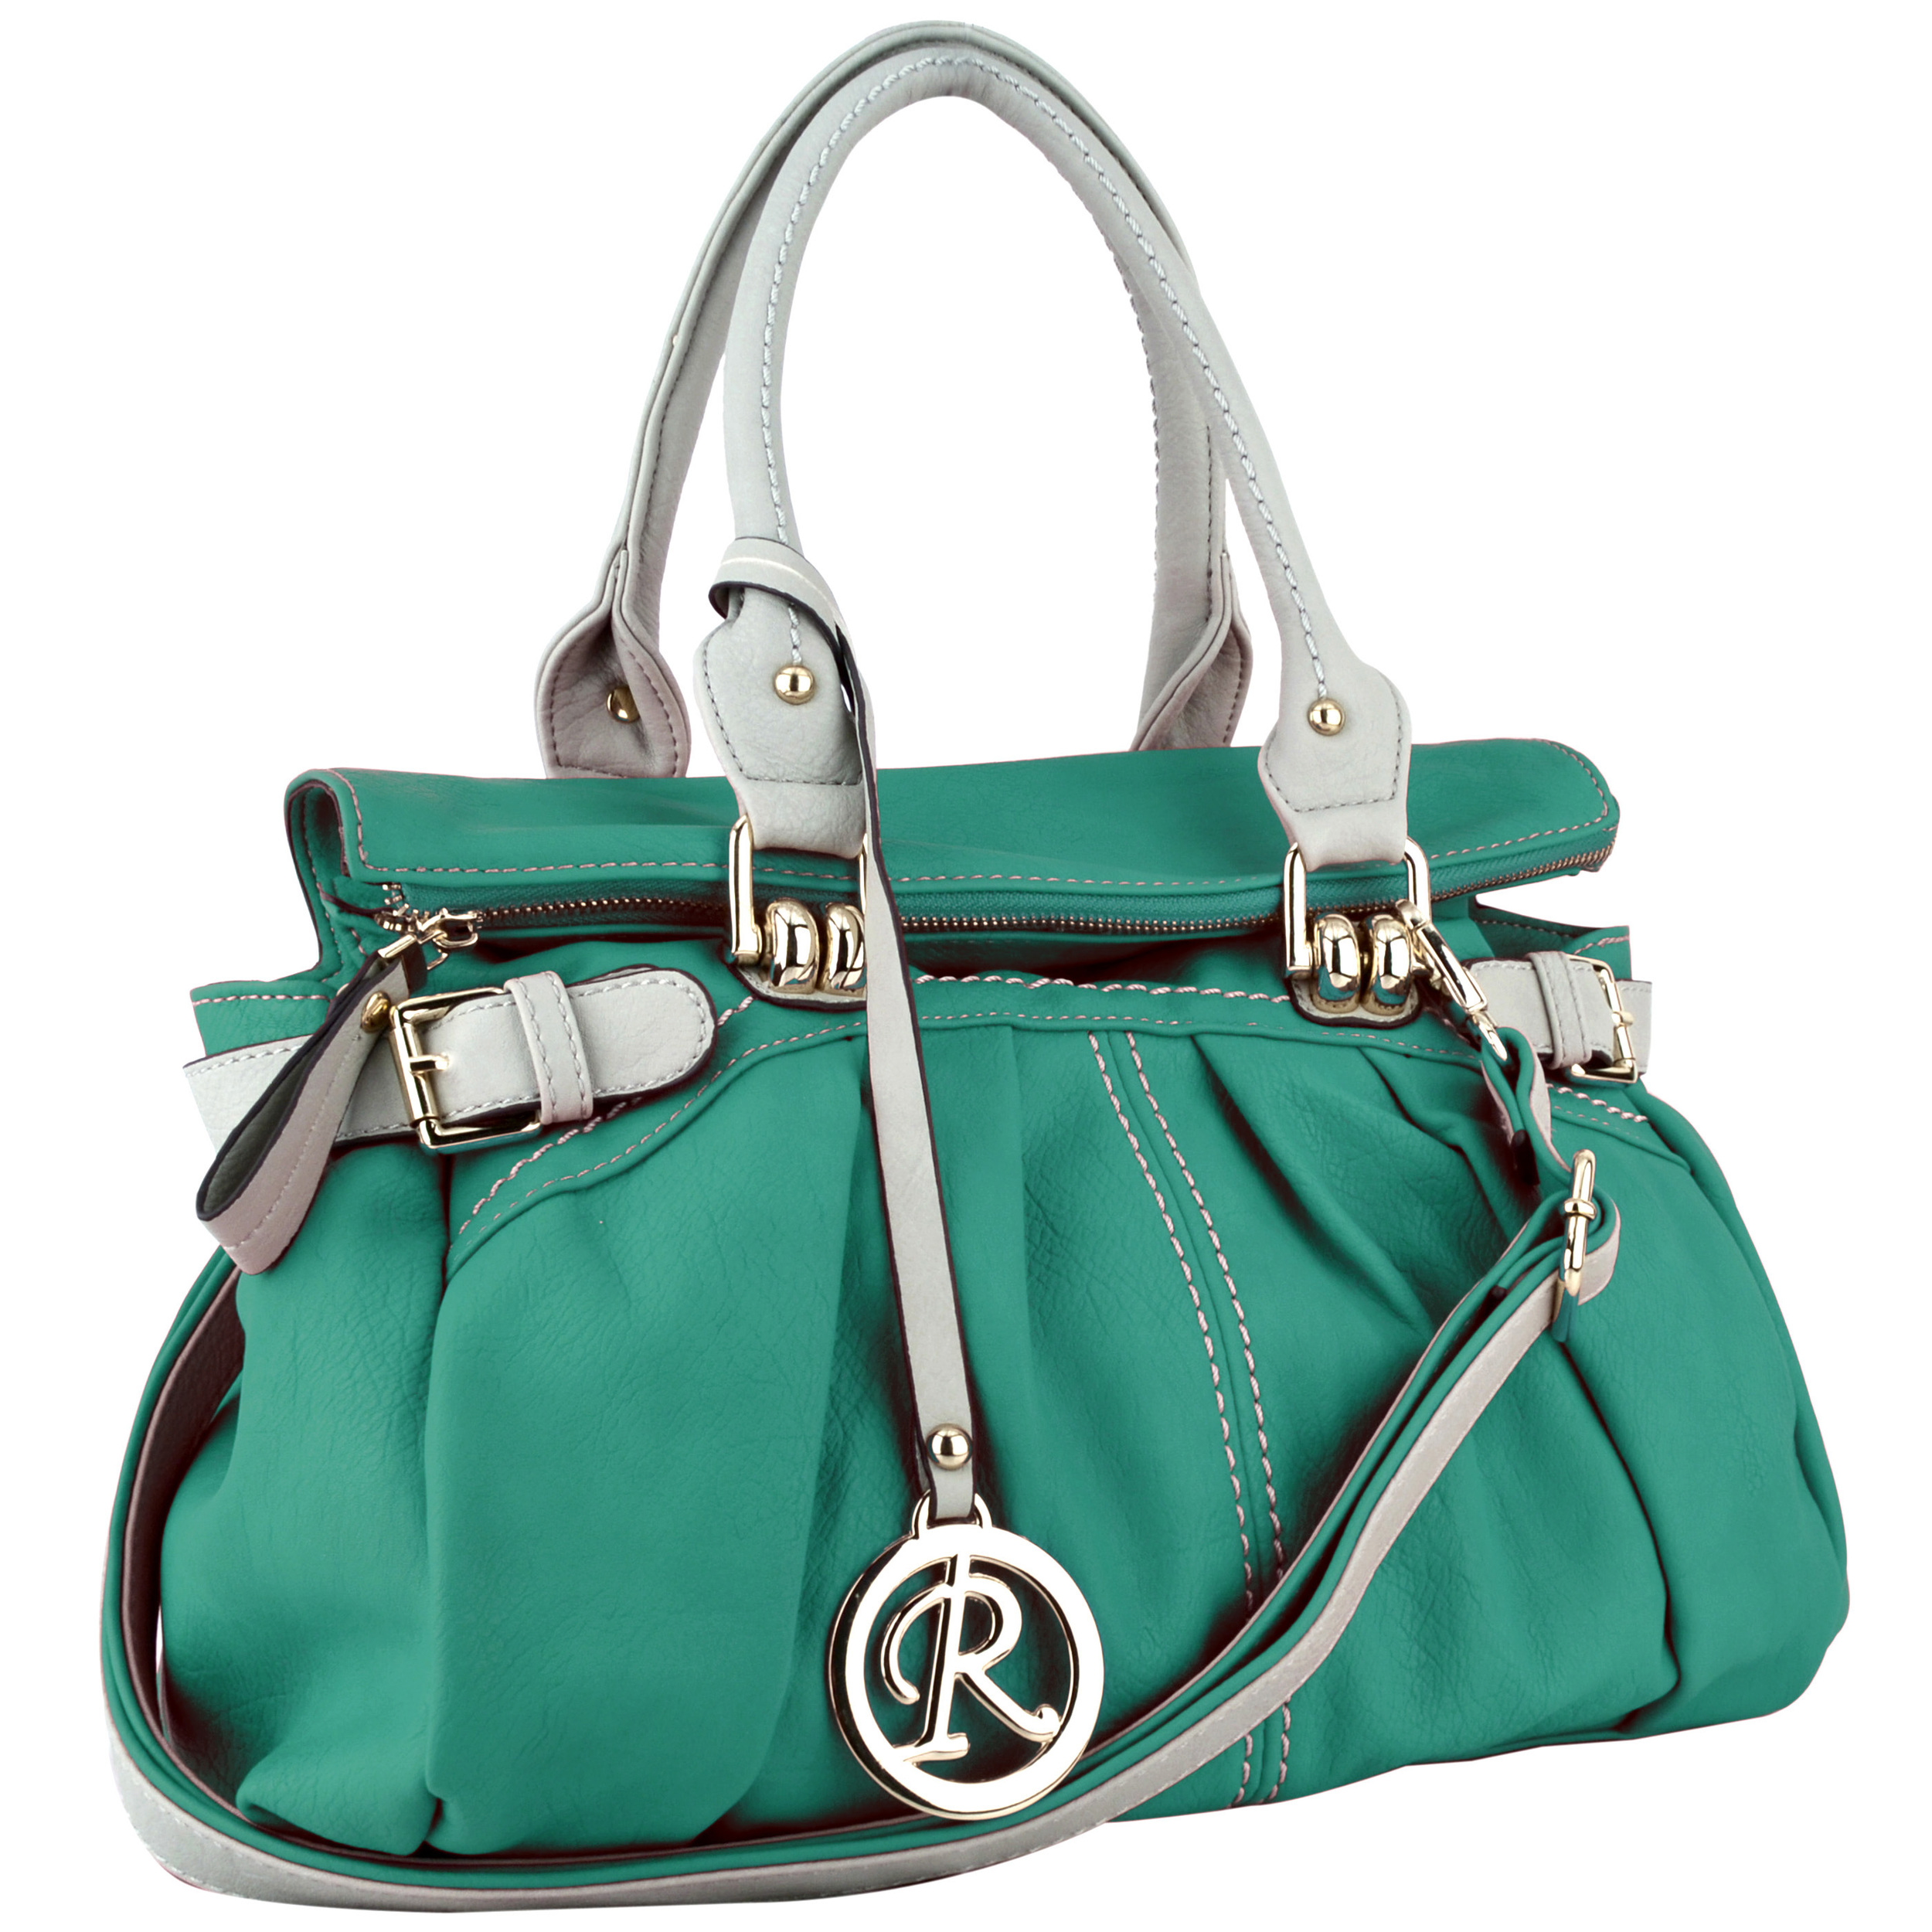 GABBY Teal Shopper Hobo Handbag Main